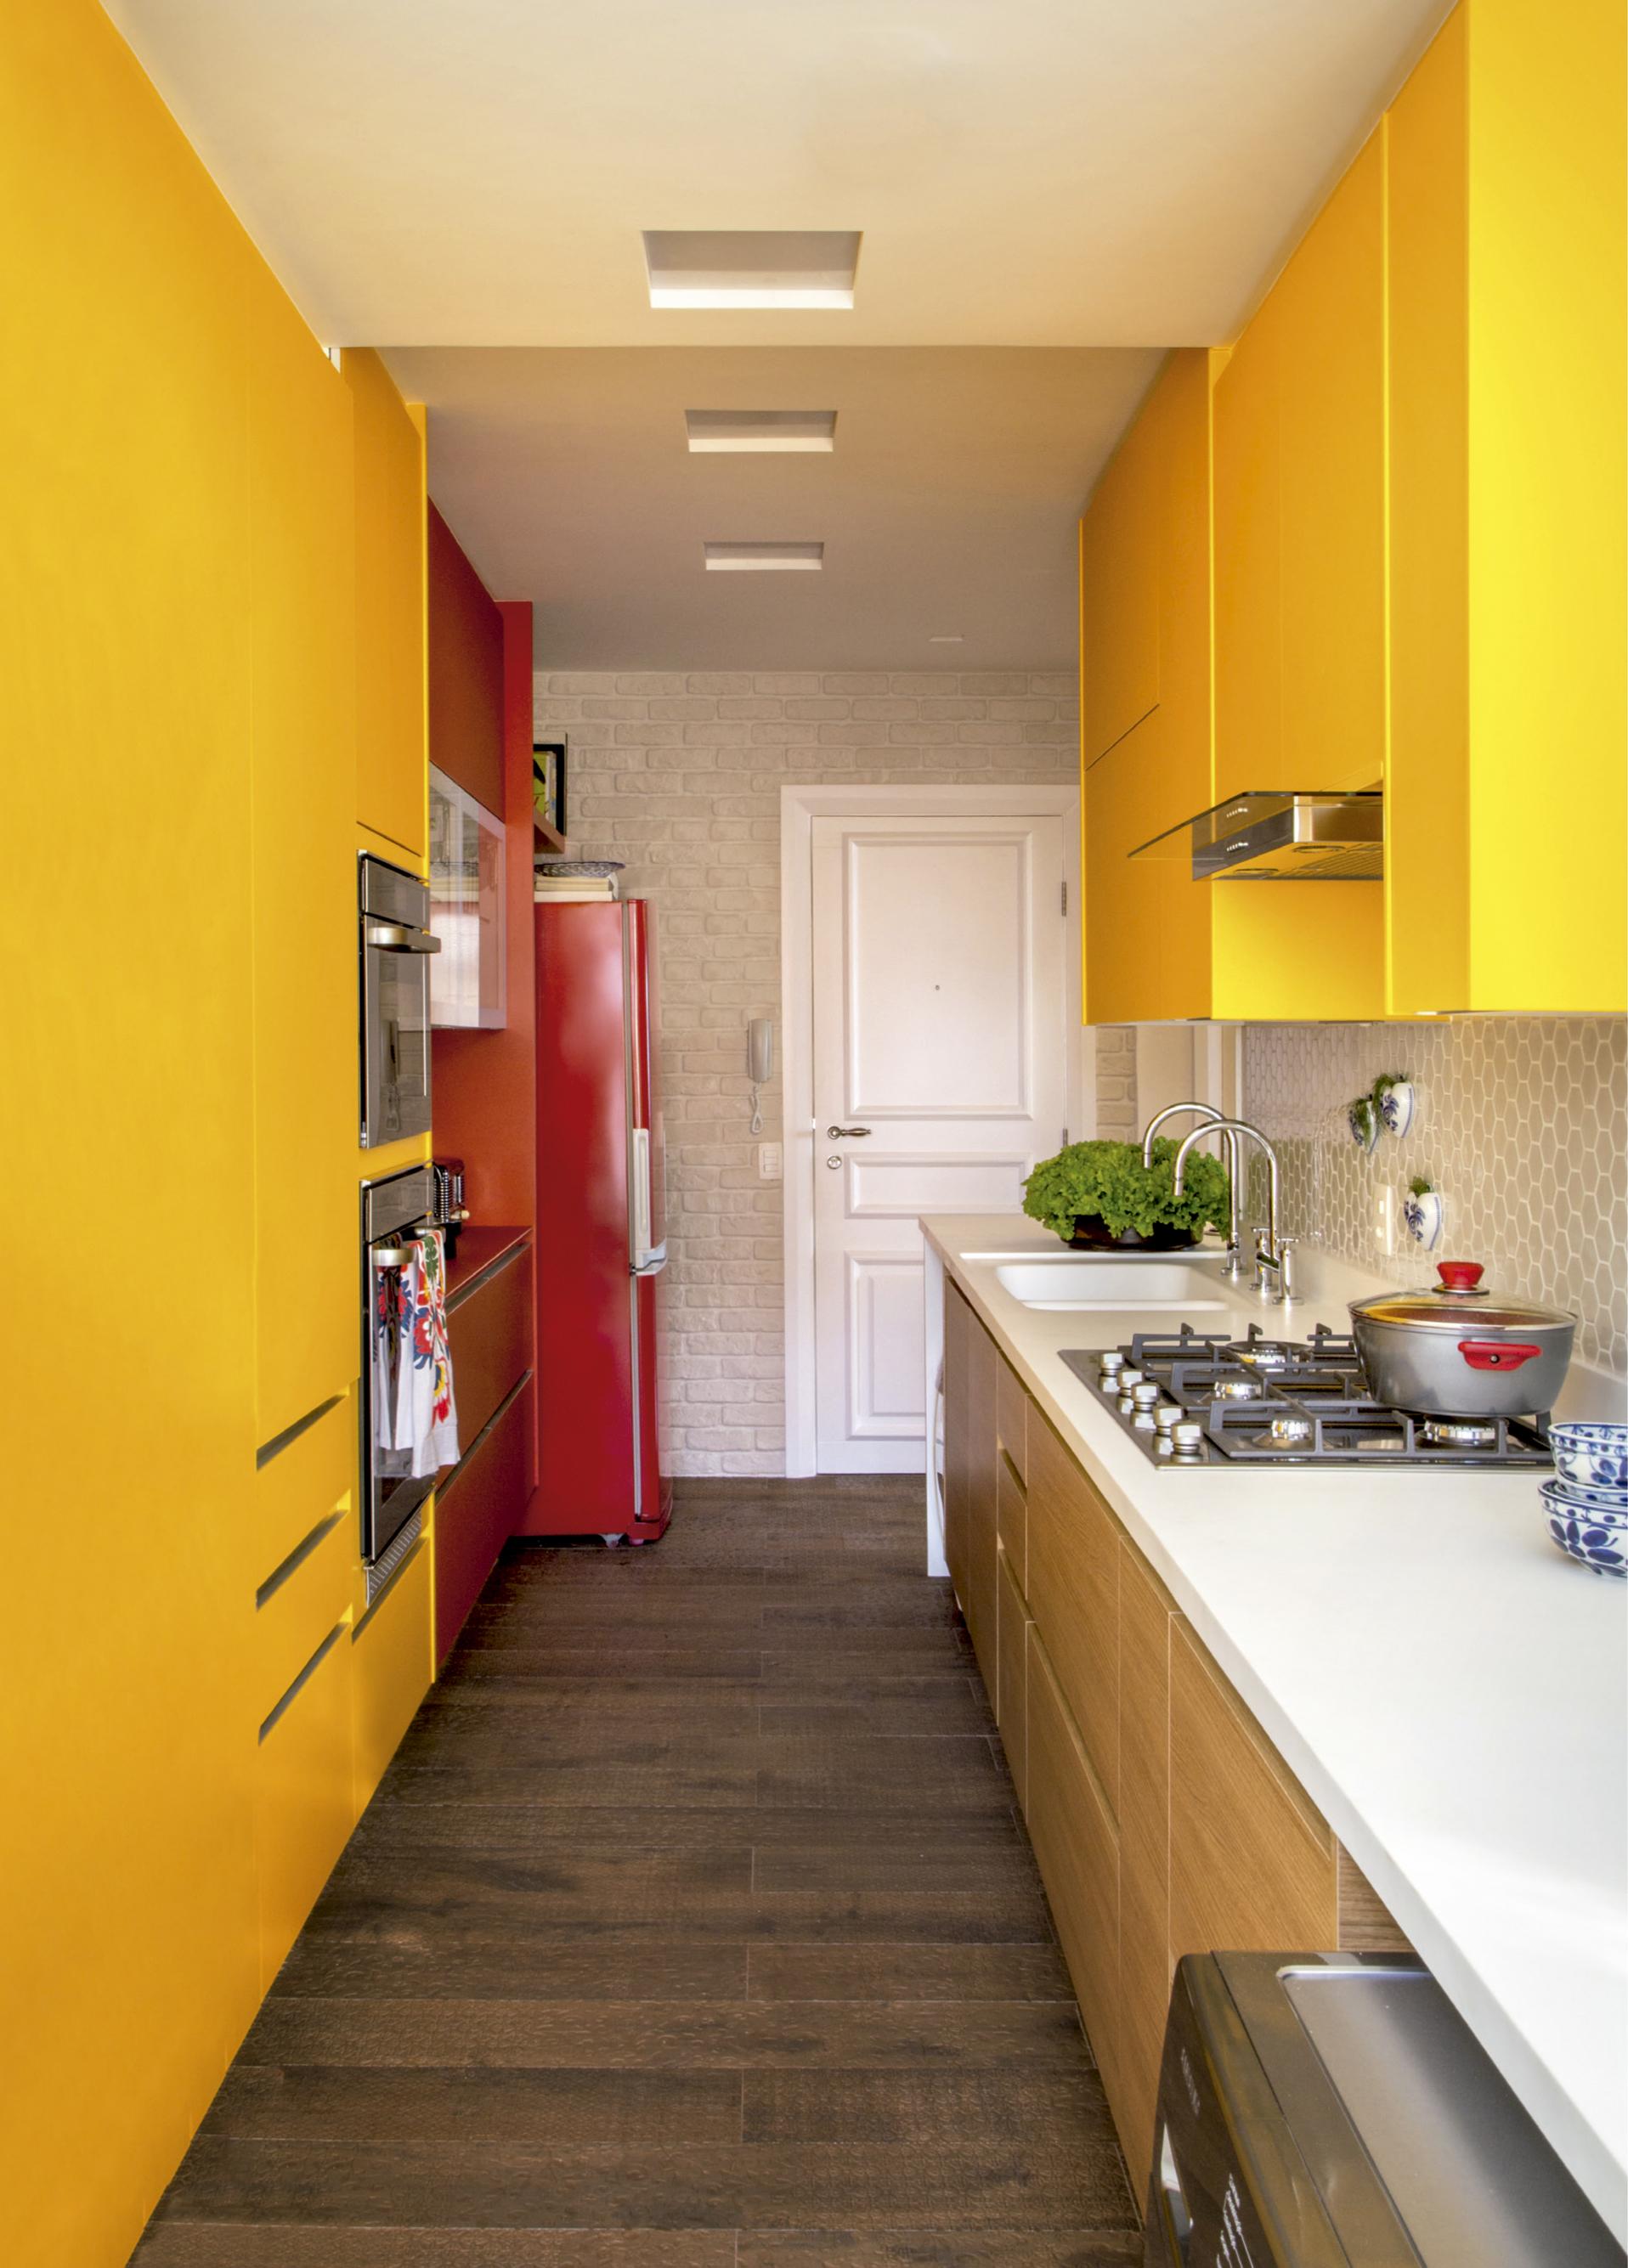 casa-claudia-cozinha-amarela-e-laranja